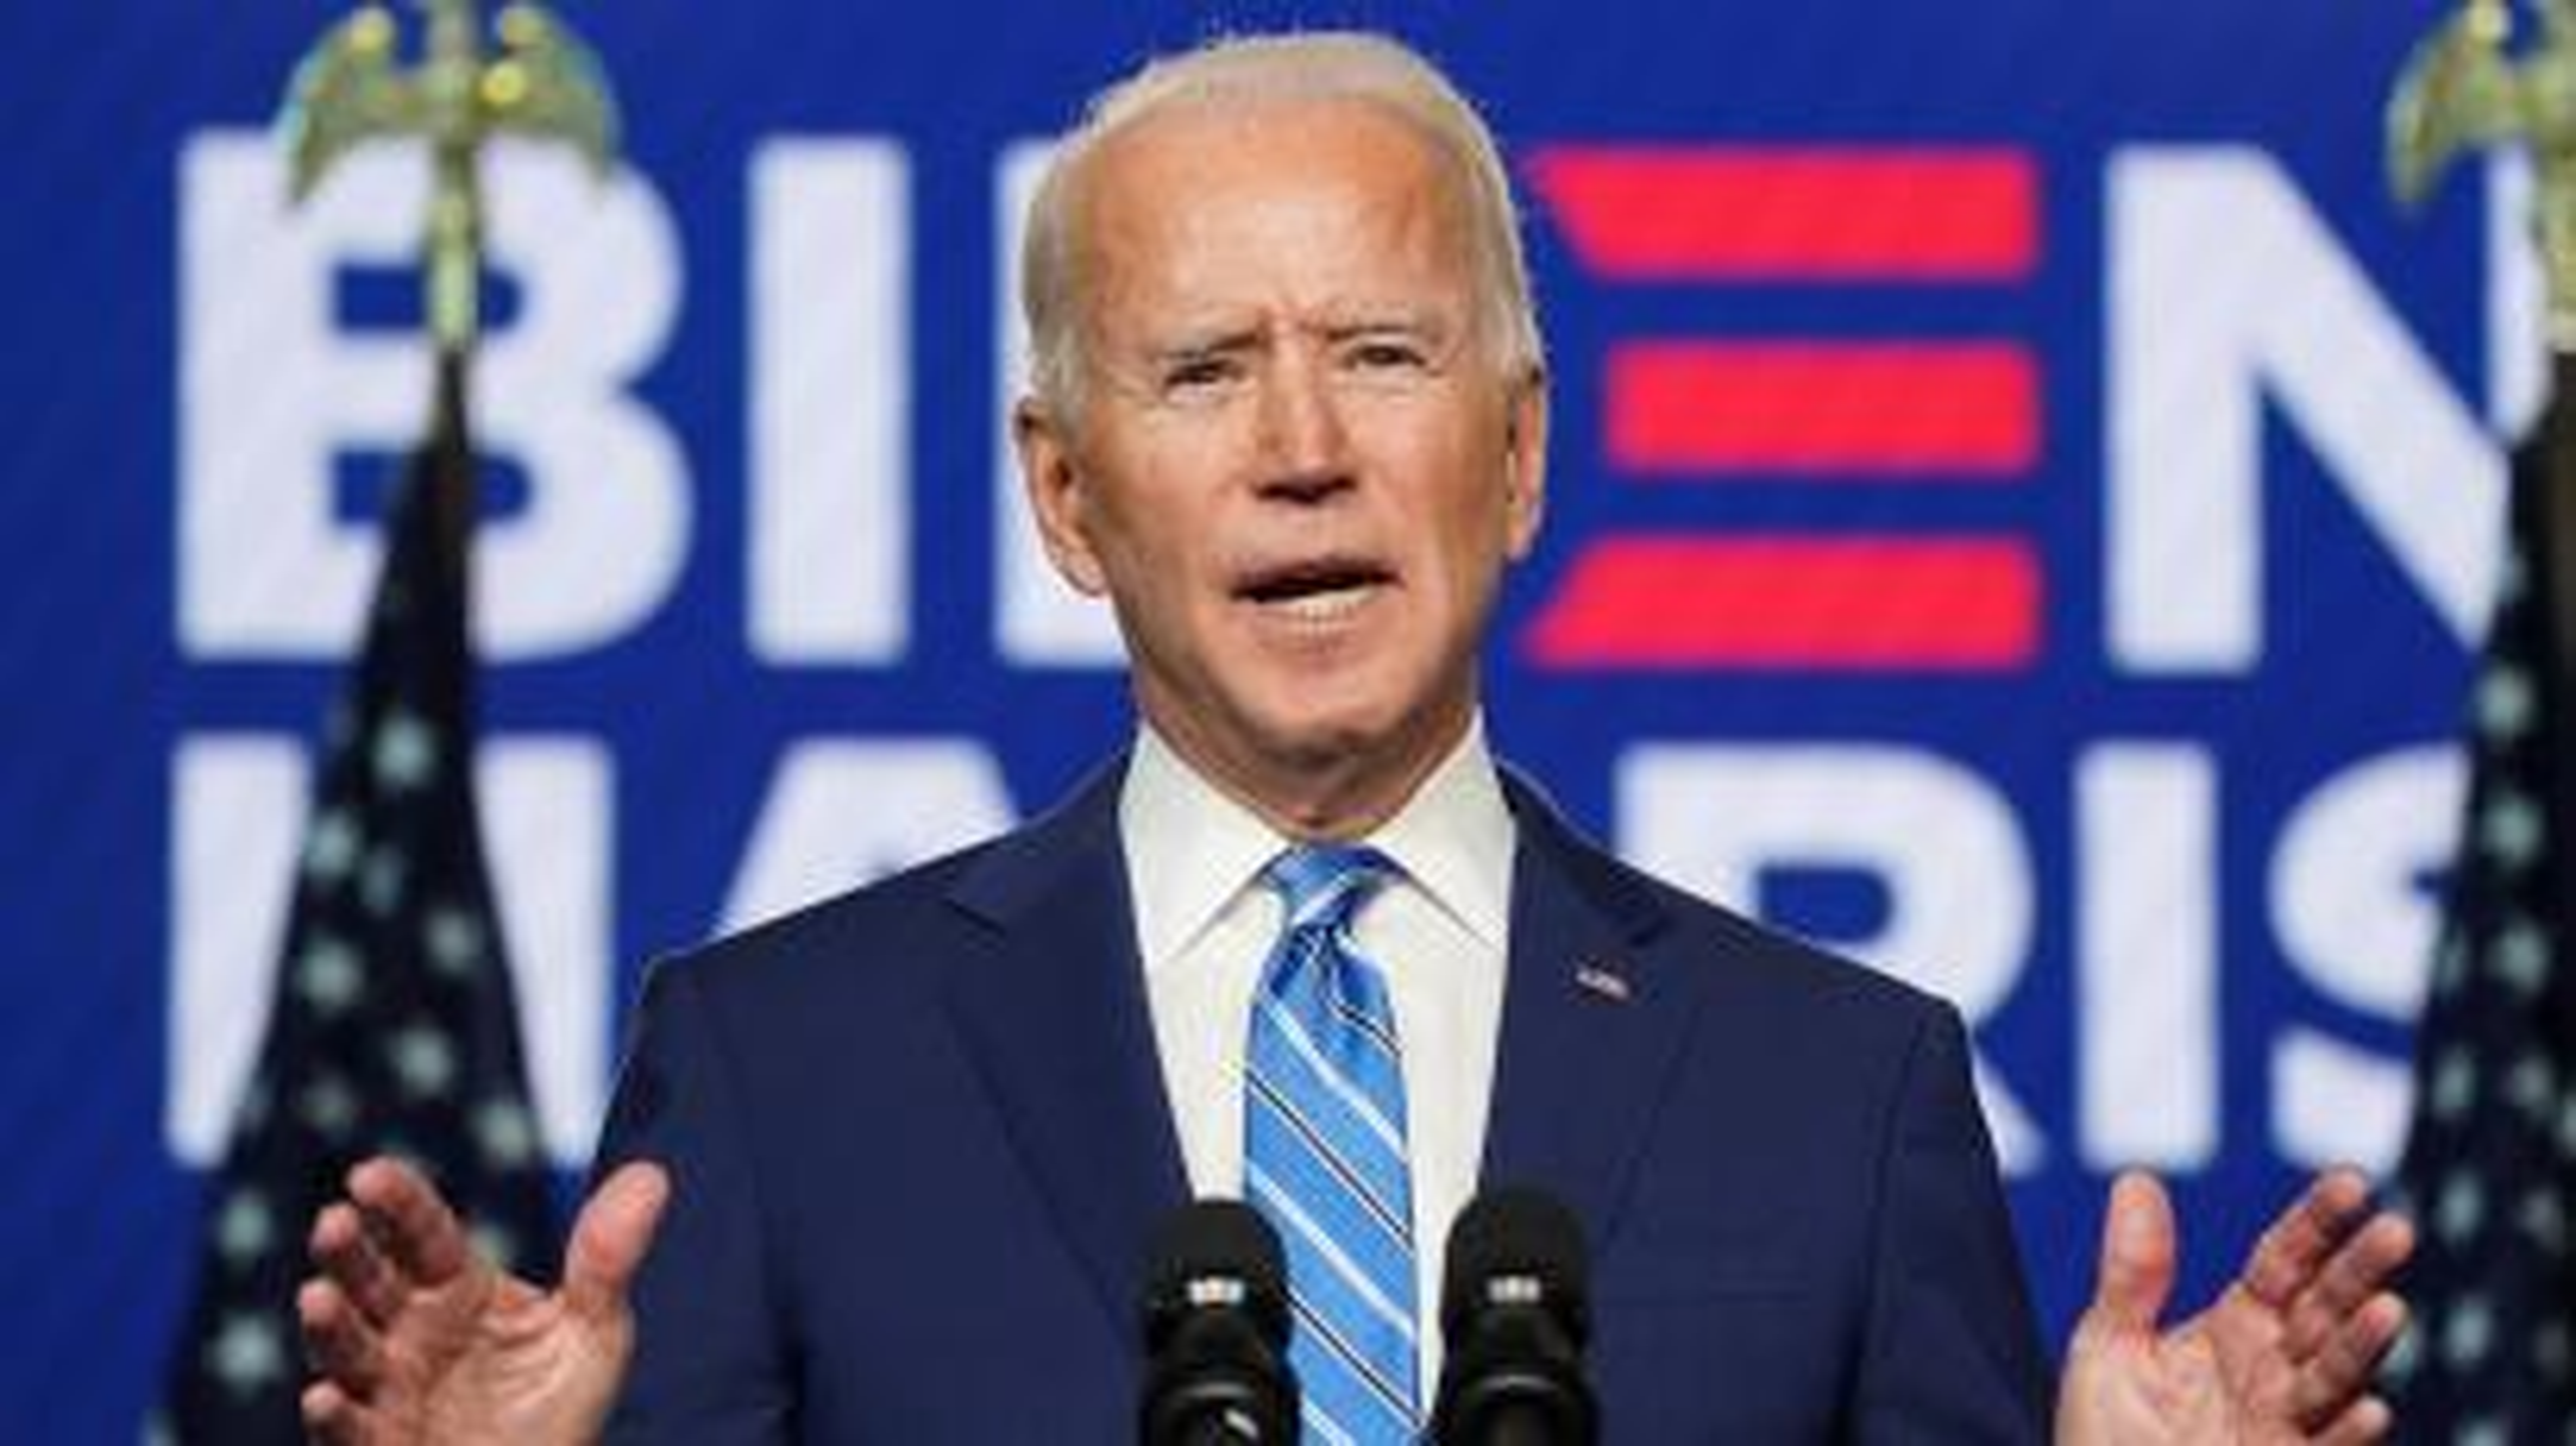 Democratic U.S. presidential nominee Joe Biden speaks about the 2020 U.S. presidential election results during an appearance in Wilmington, Delaware, U.S., November 4, 2020.